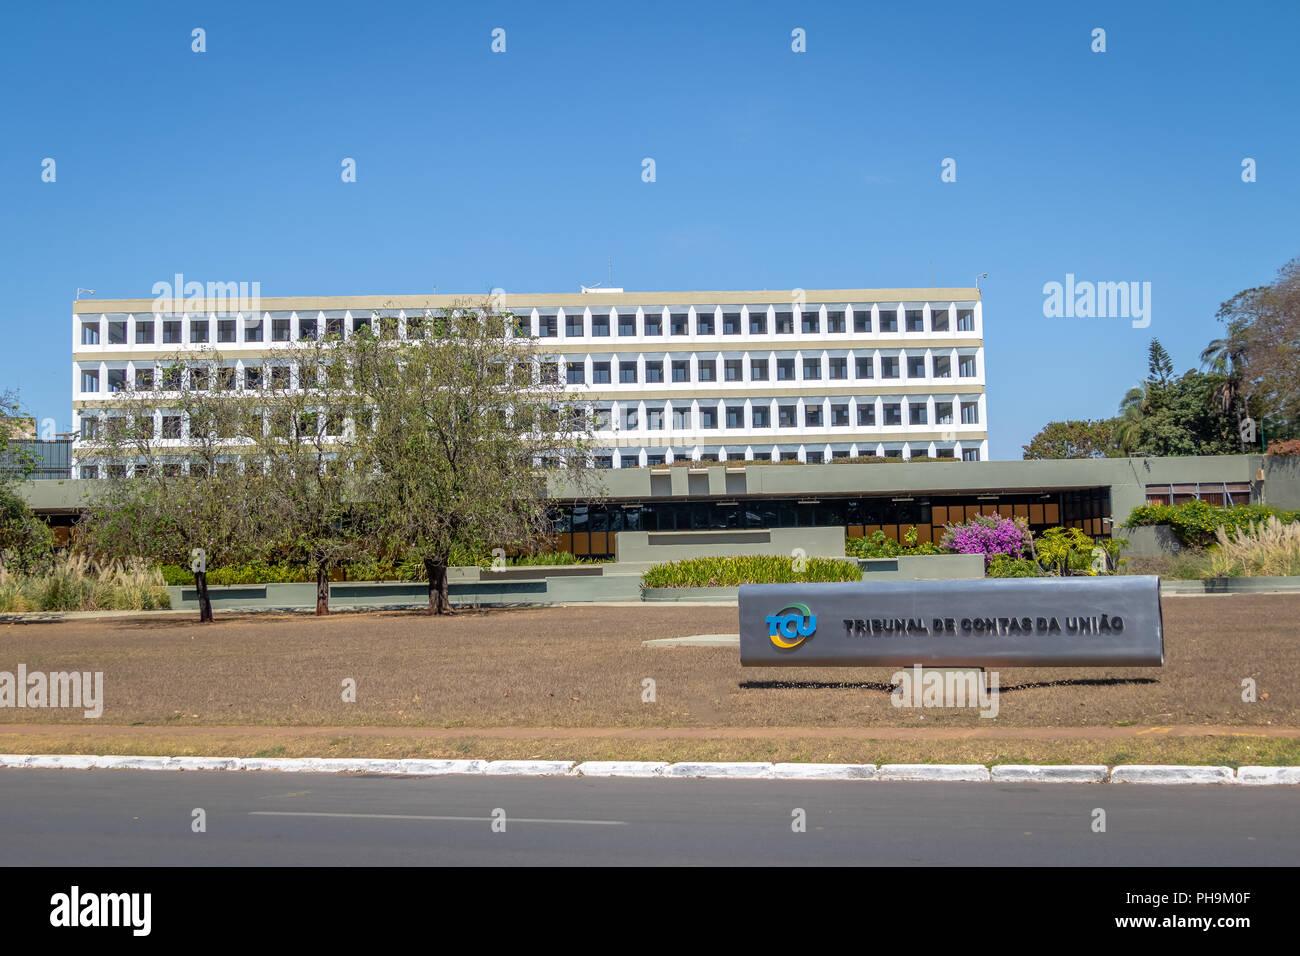 Federal Court of Accounts the Brazilian federal accountability office (Tribunal de Contas da Uniao - TCU) - Brasilia, Brazil - Stock Image